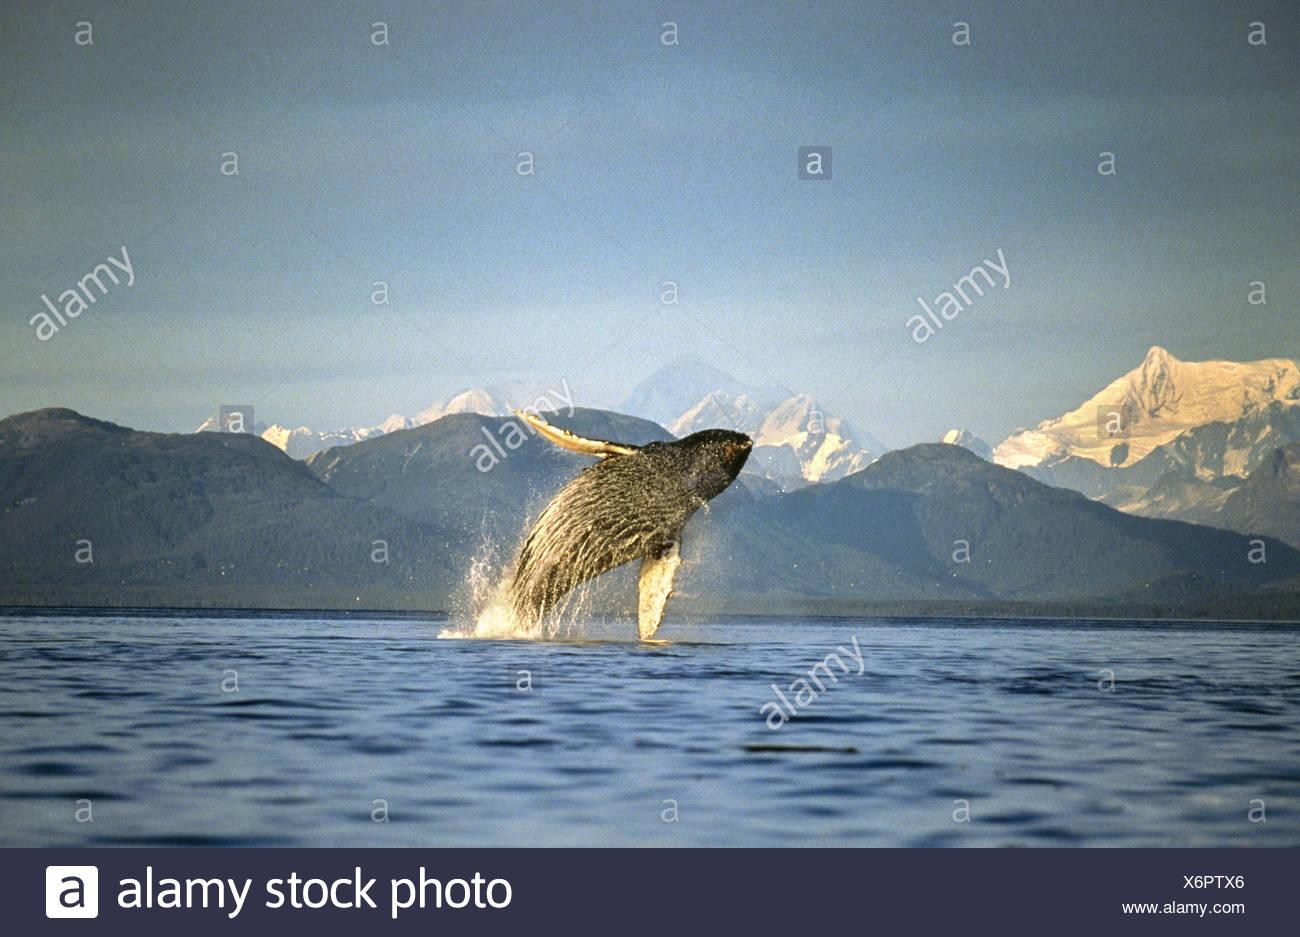 Humpback Whale breaching, Icy Straits, Southeast Alaska - Stock Image